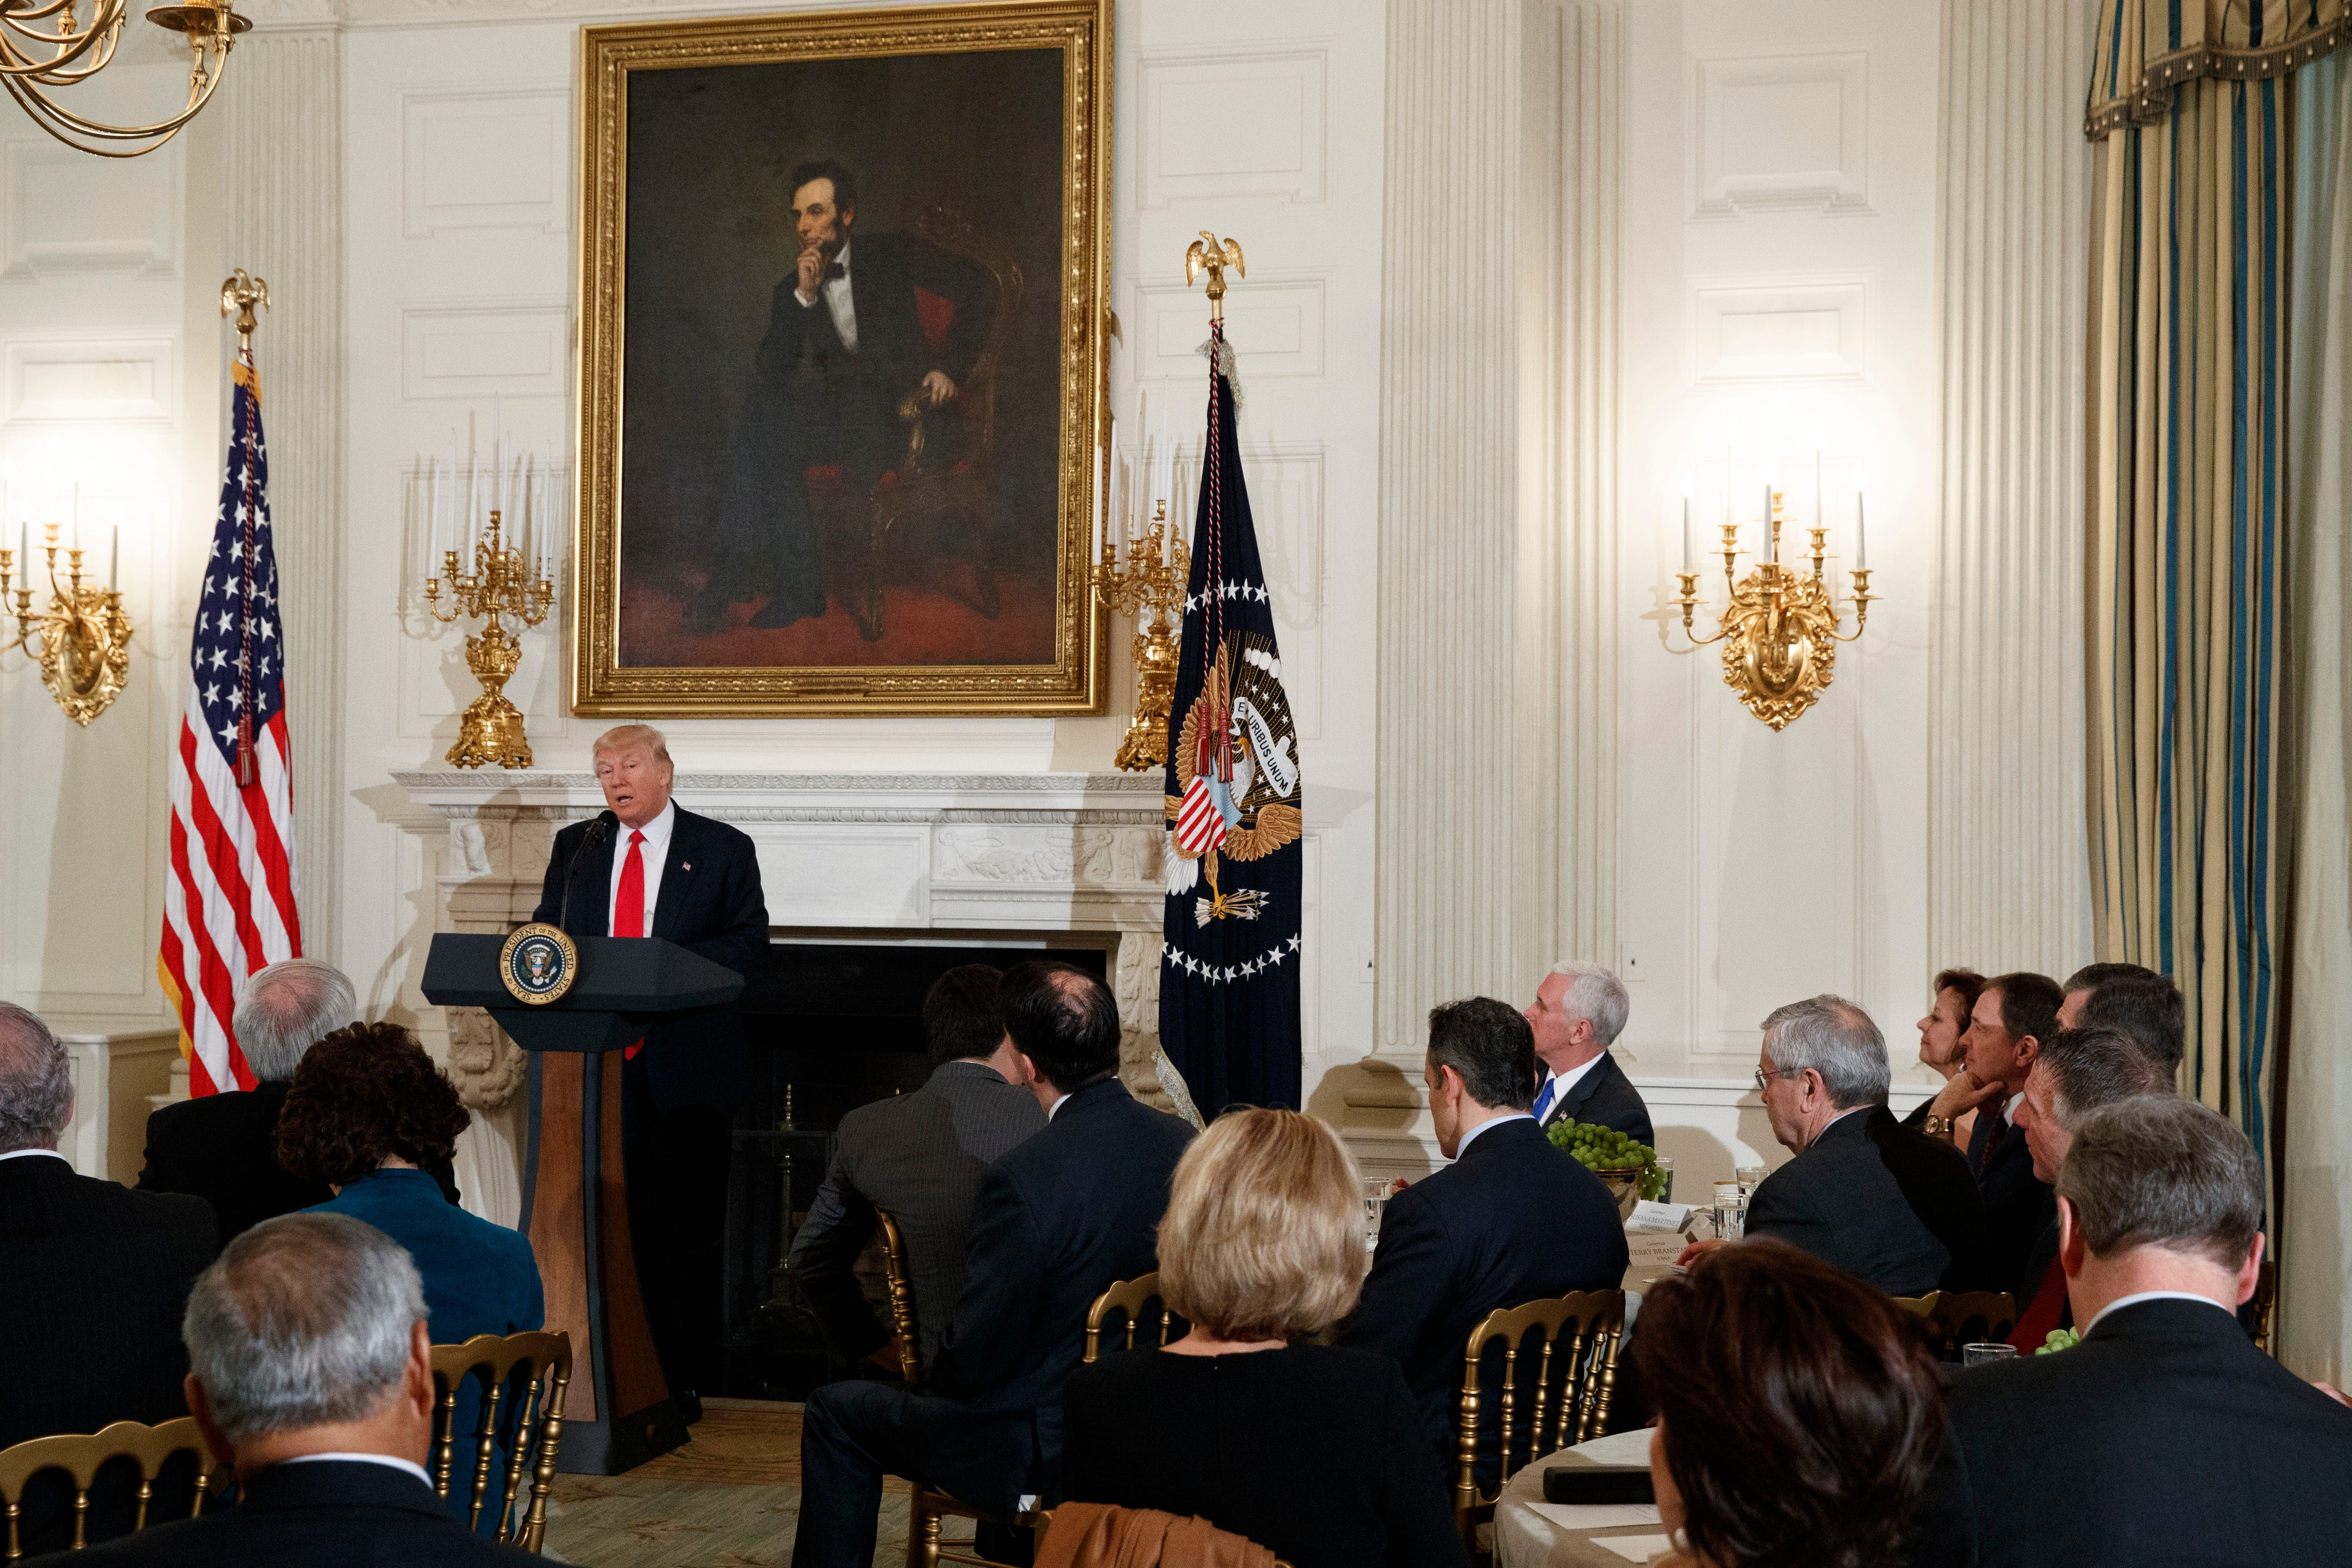 Trump budget to increase defense, slash EPA, other agencies